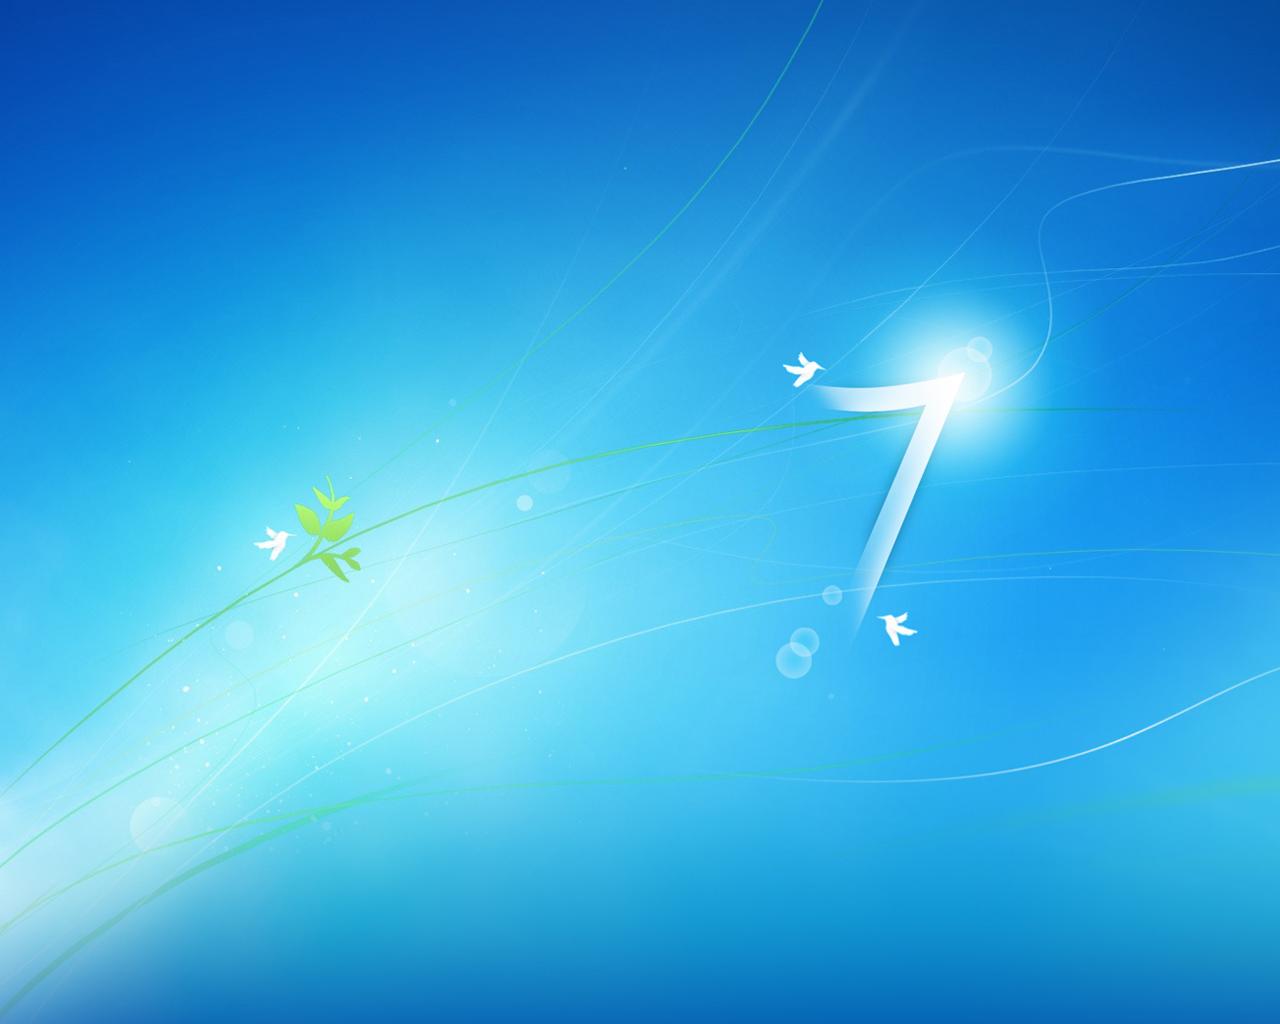 Free Wallpaper Download: Top 10 Microsoft Windows 7